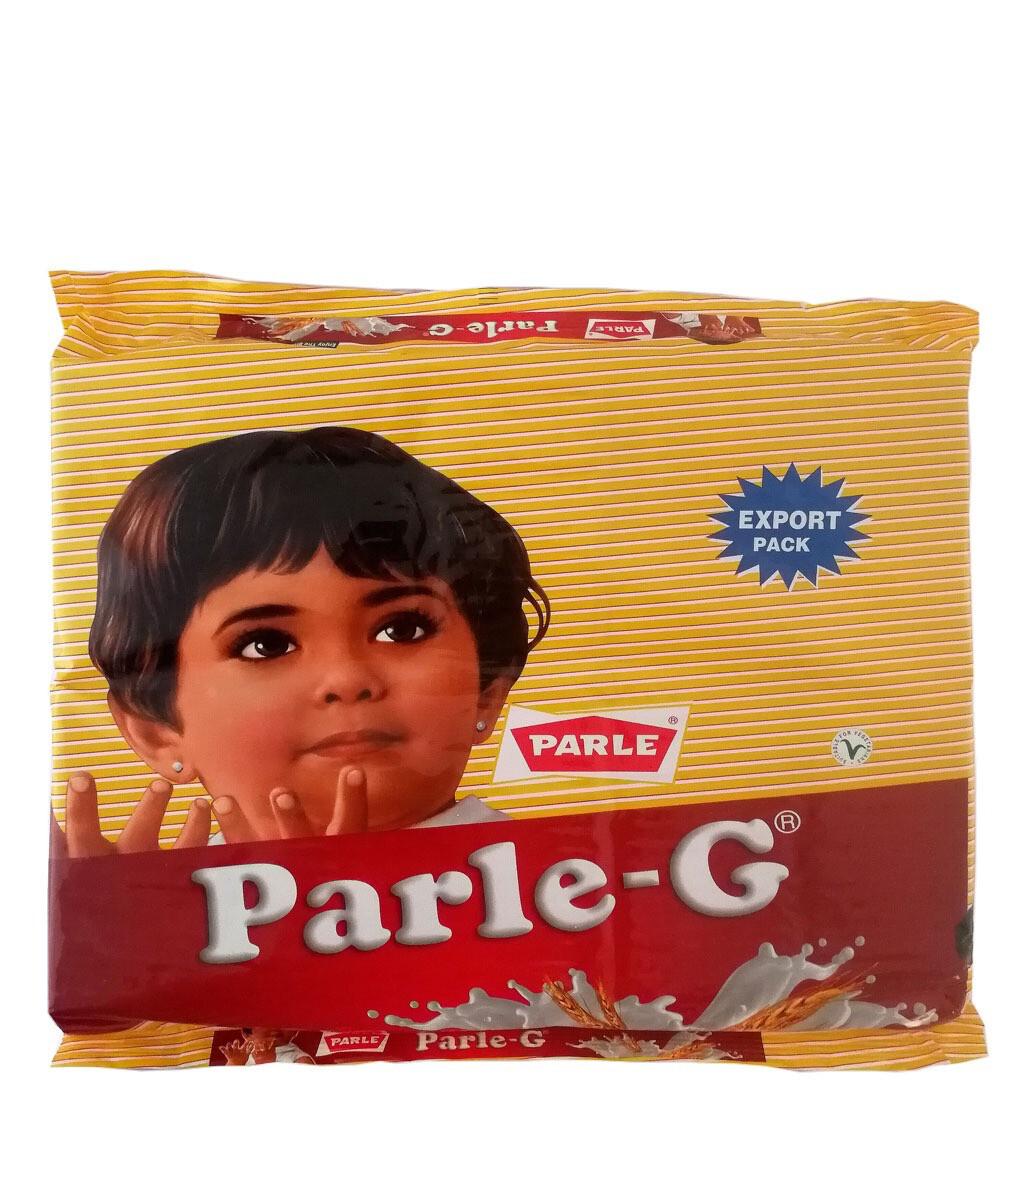 PARLE G BIG 799G (EXPORT PACK)